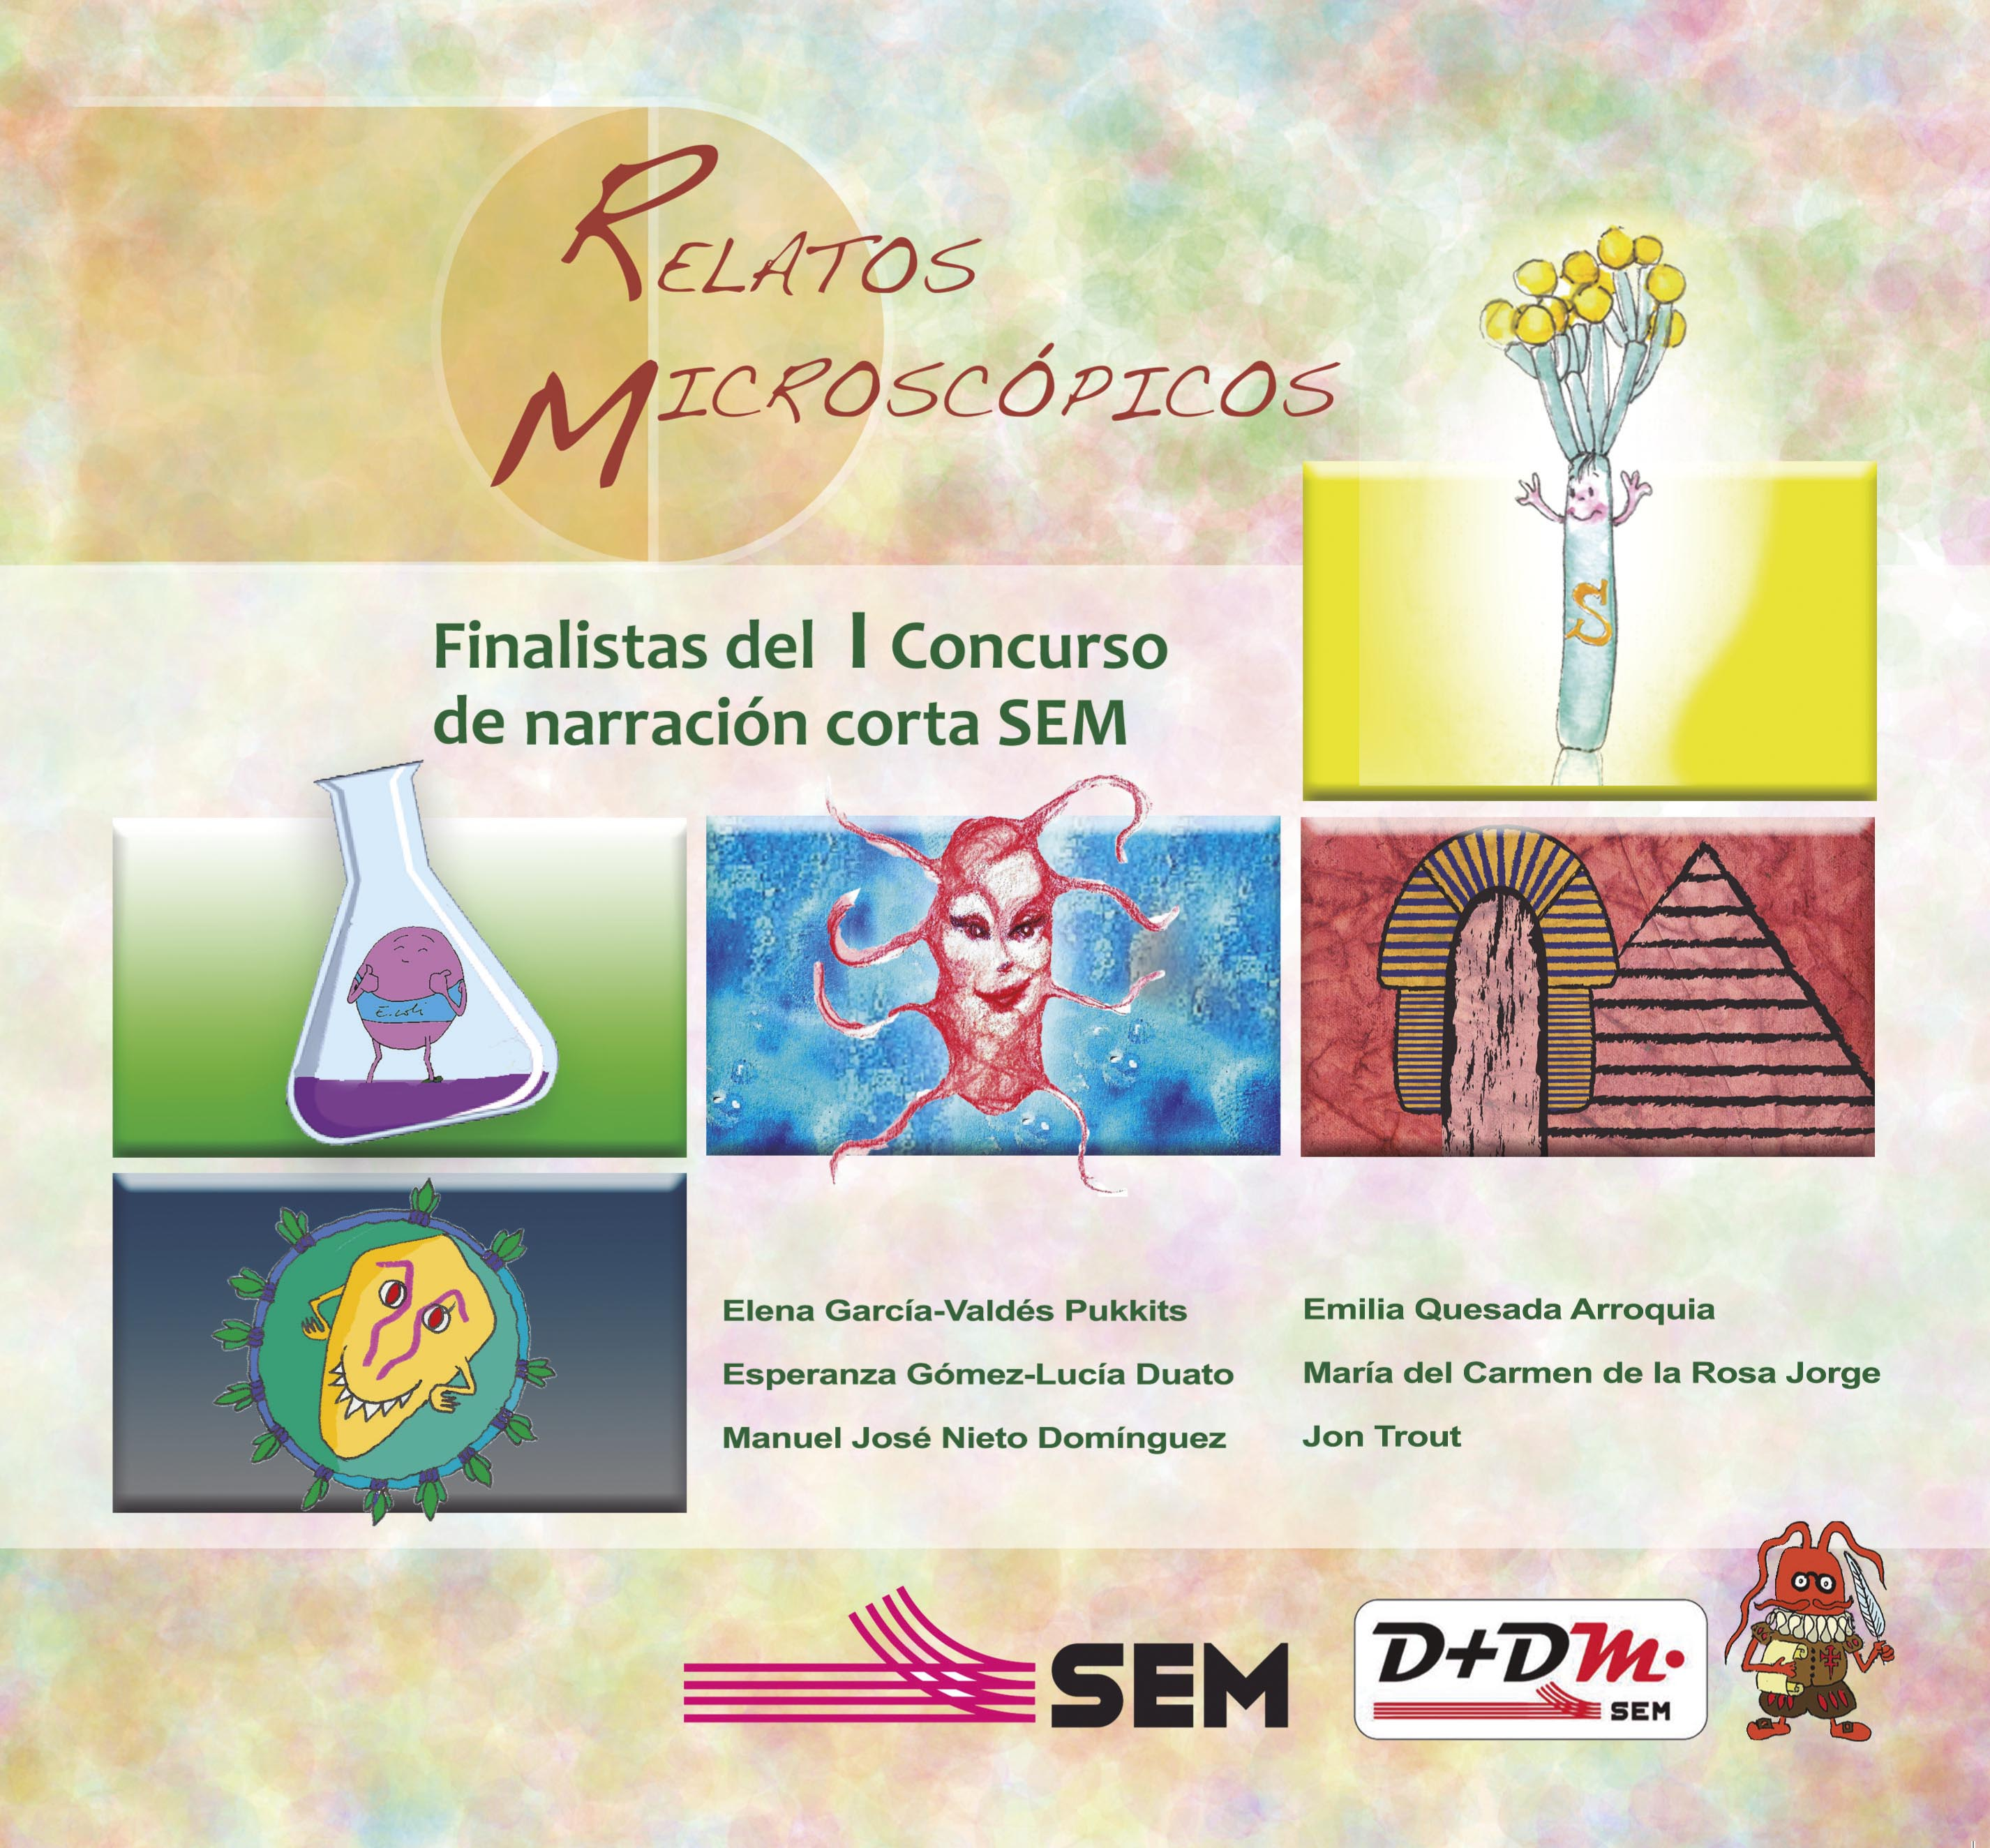 RELATOS MICROSCÓPICOS. Selección de relatos finalistas del I Concurso científico-literario de narración corta SEM